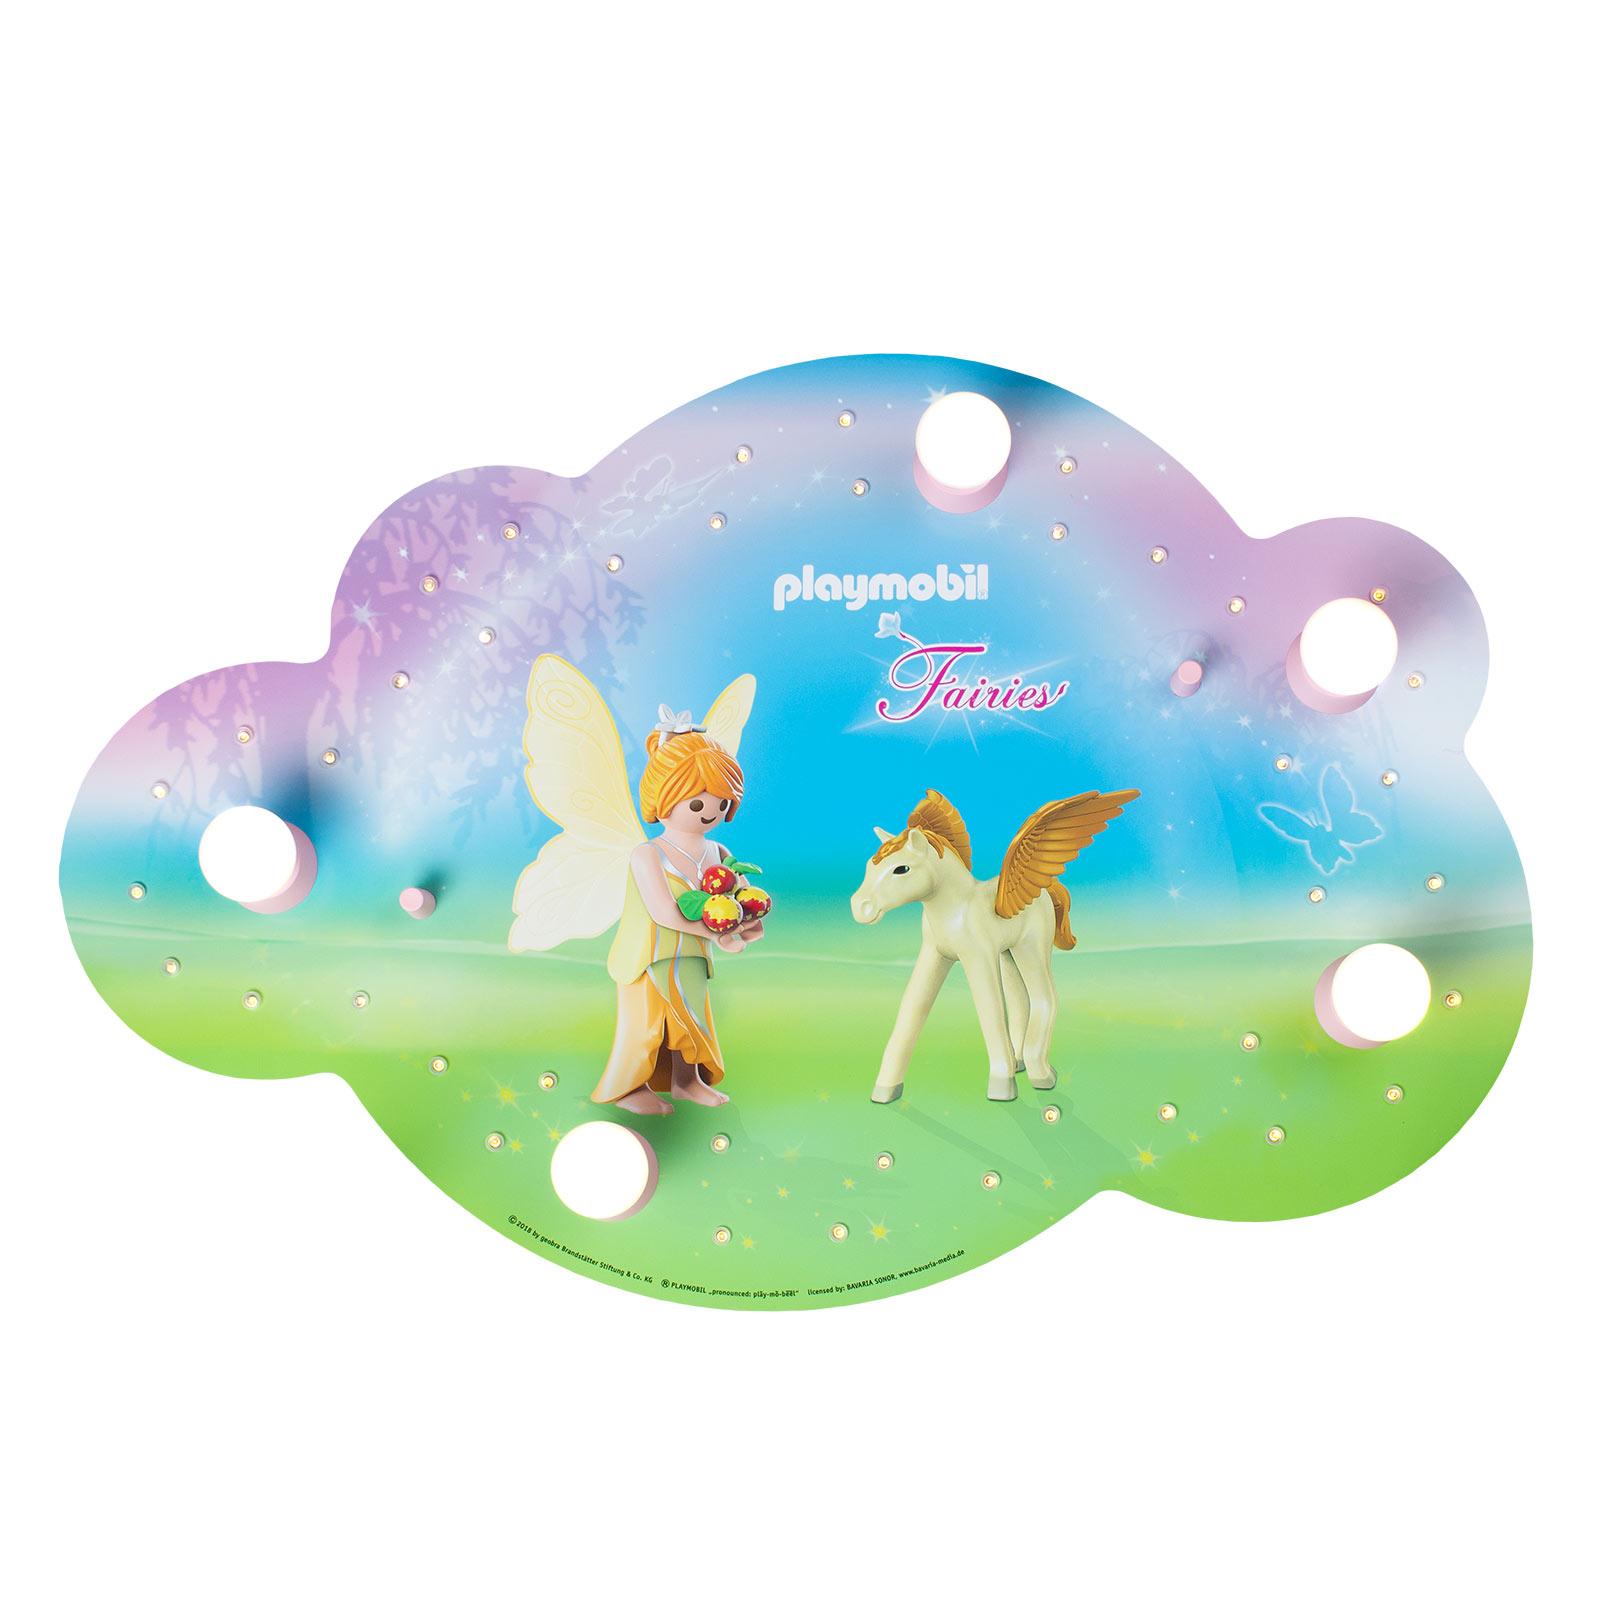 Plafondlamp Beeldwolk PLAYMOBIL Fairies